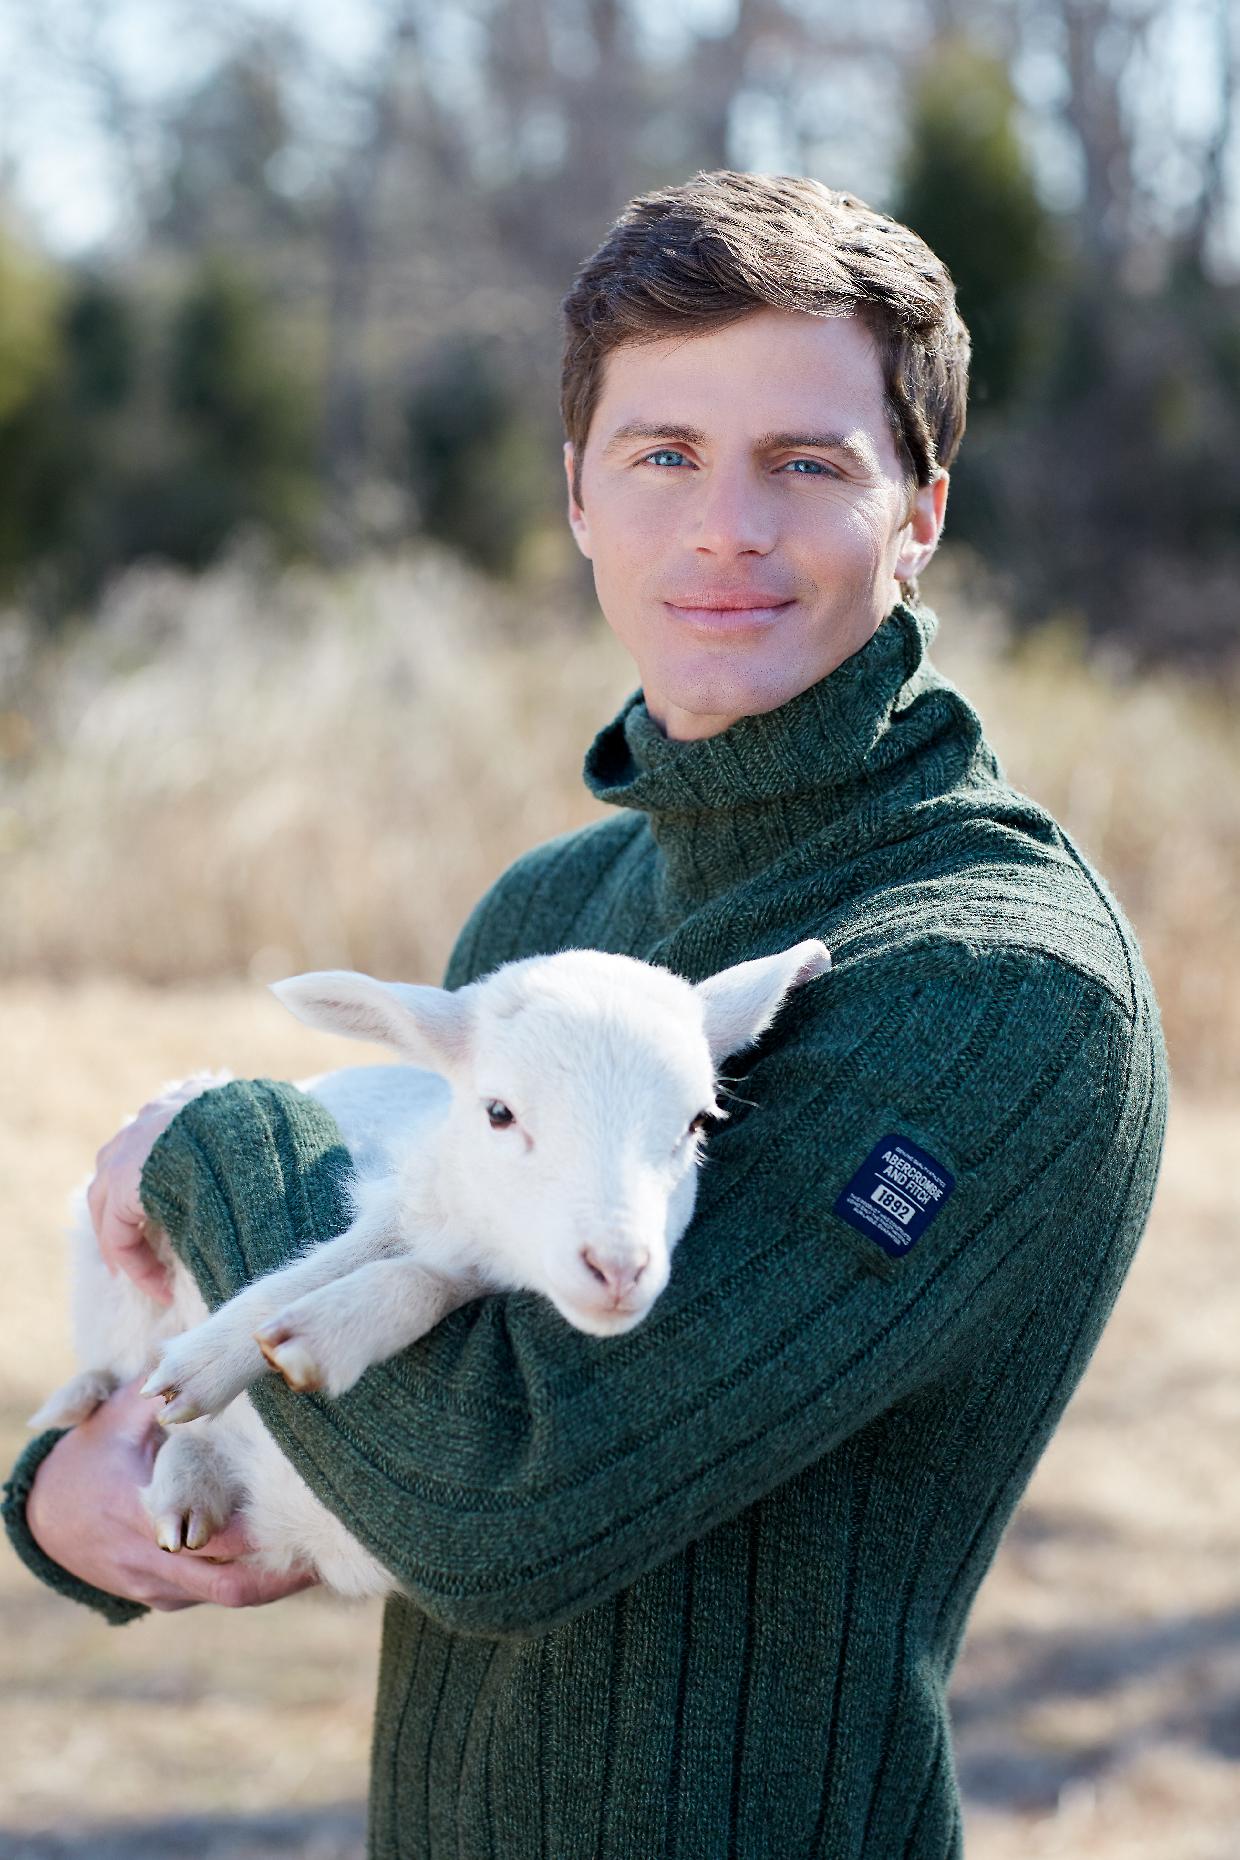 Fashionable Farmer + Abercrombie & Fitch + Lamb